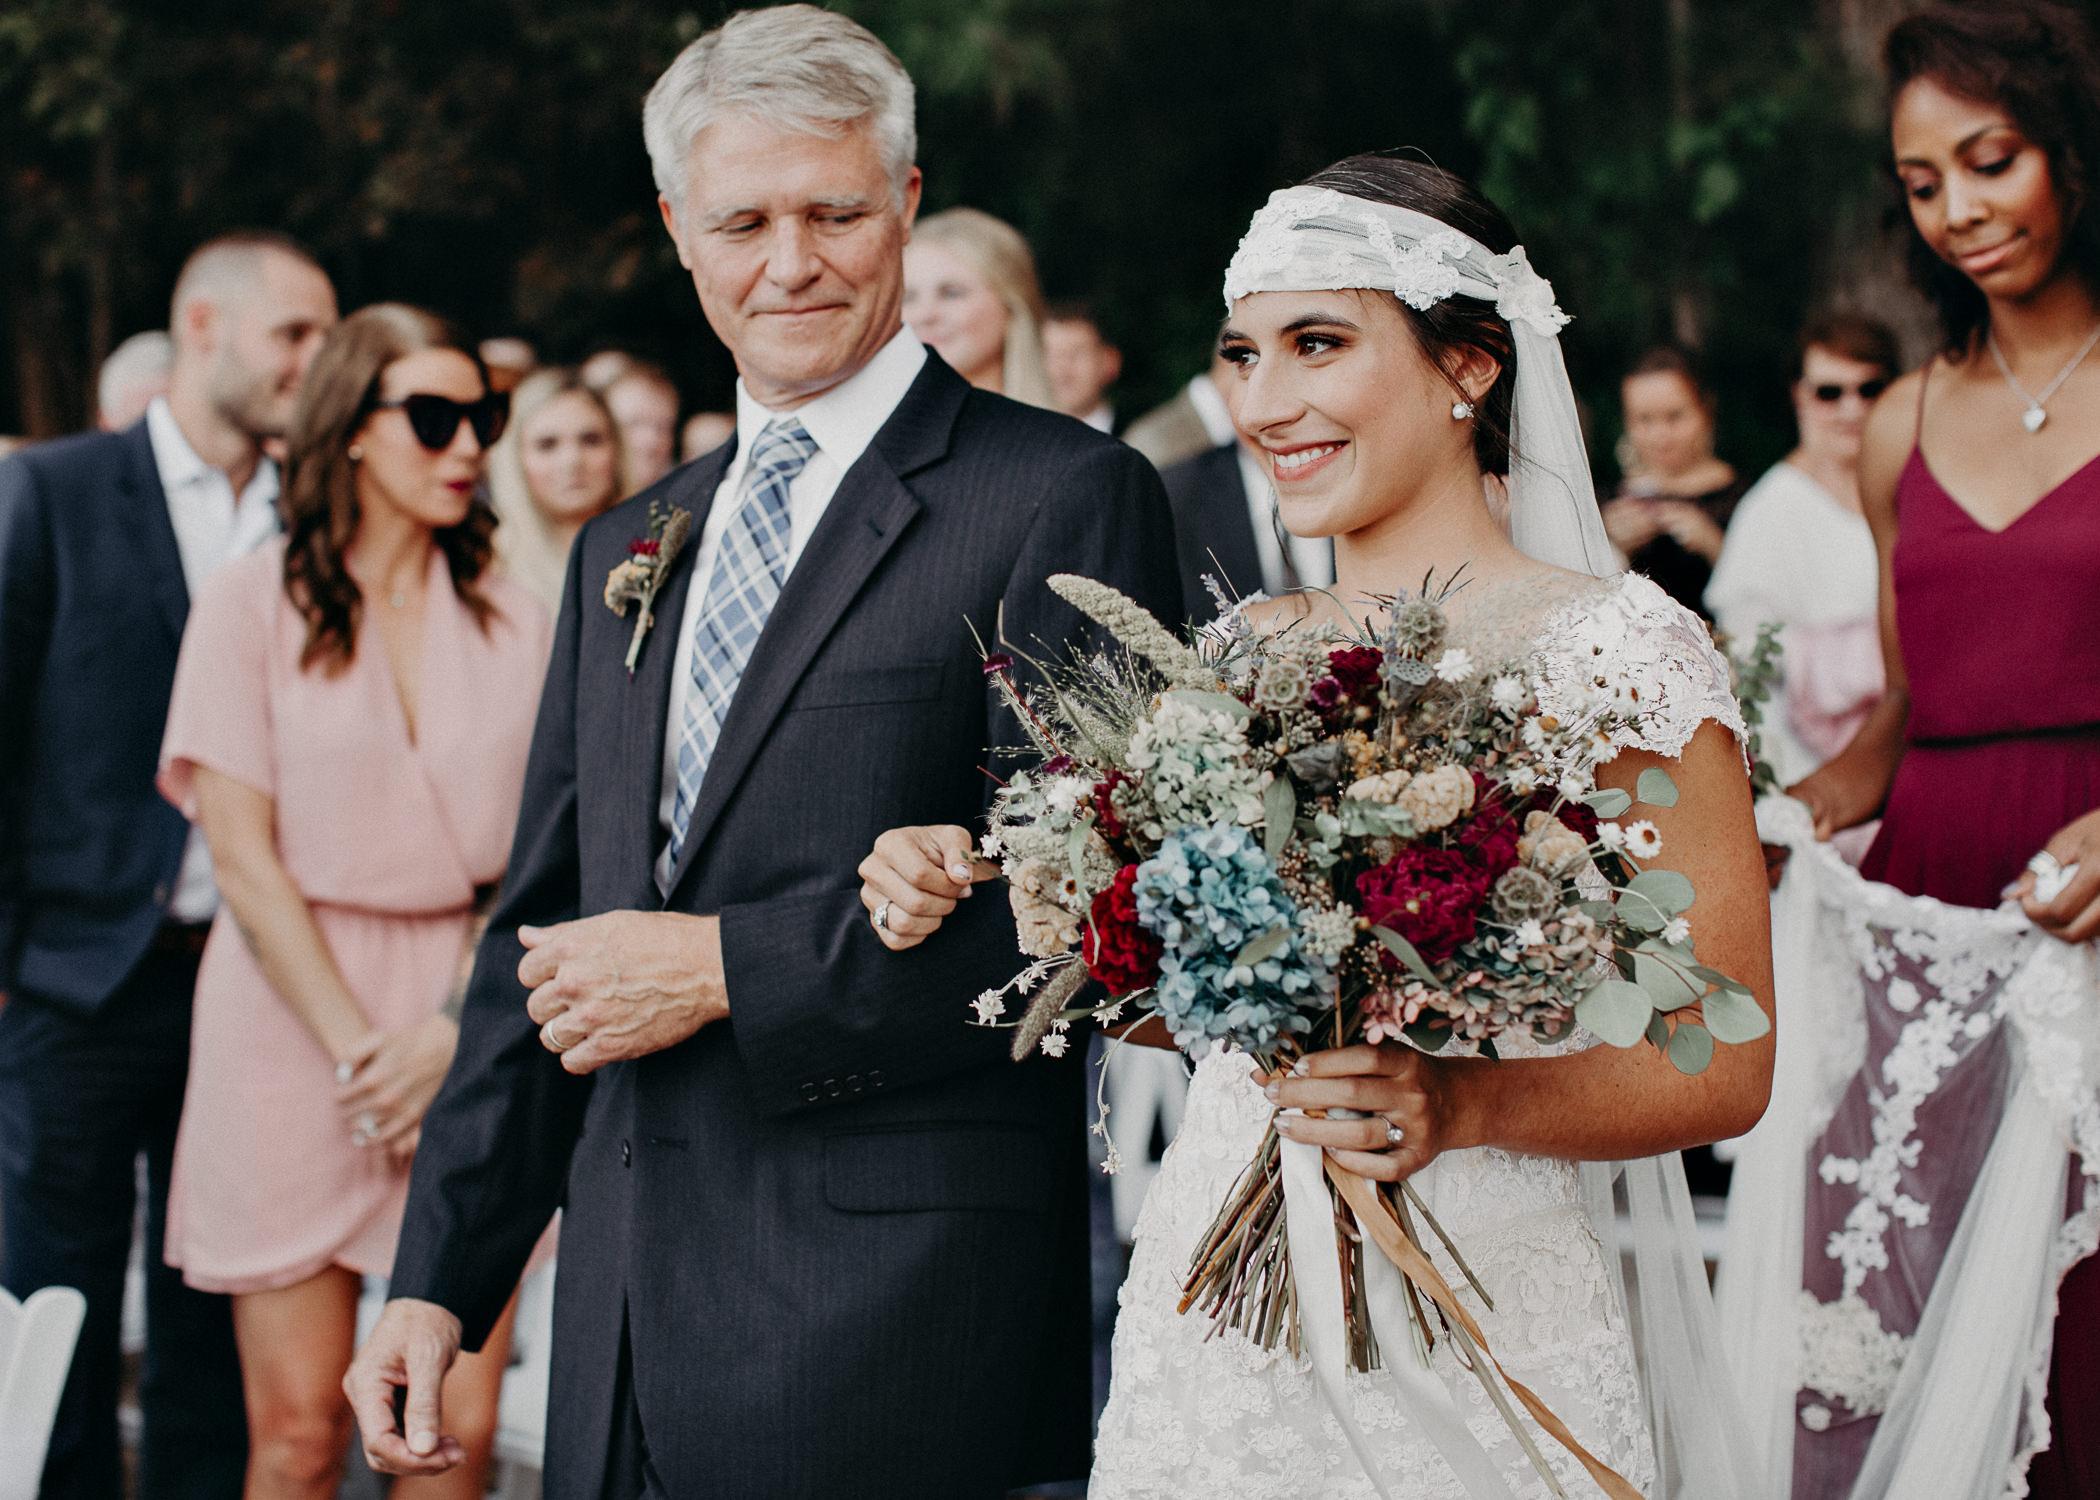 96 - Bride walking down the aisle -  Wedding Ceremony - Destination Wedding : Beach : Lake Wedding Atlanta Wedding Photographer .jpg